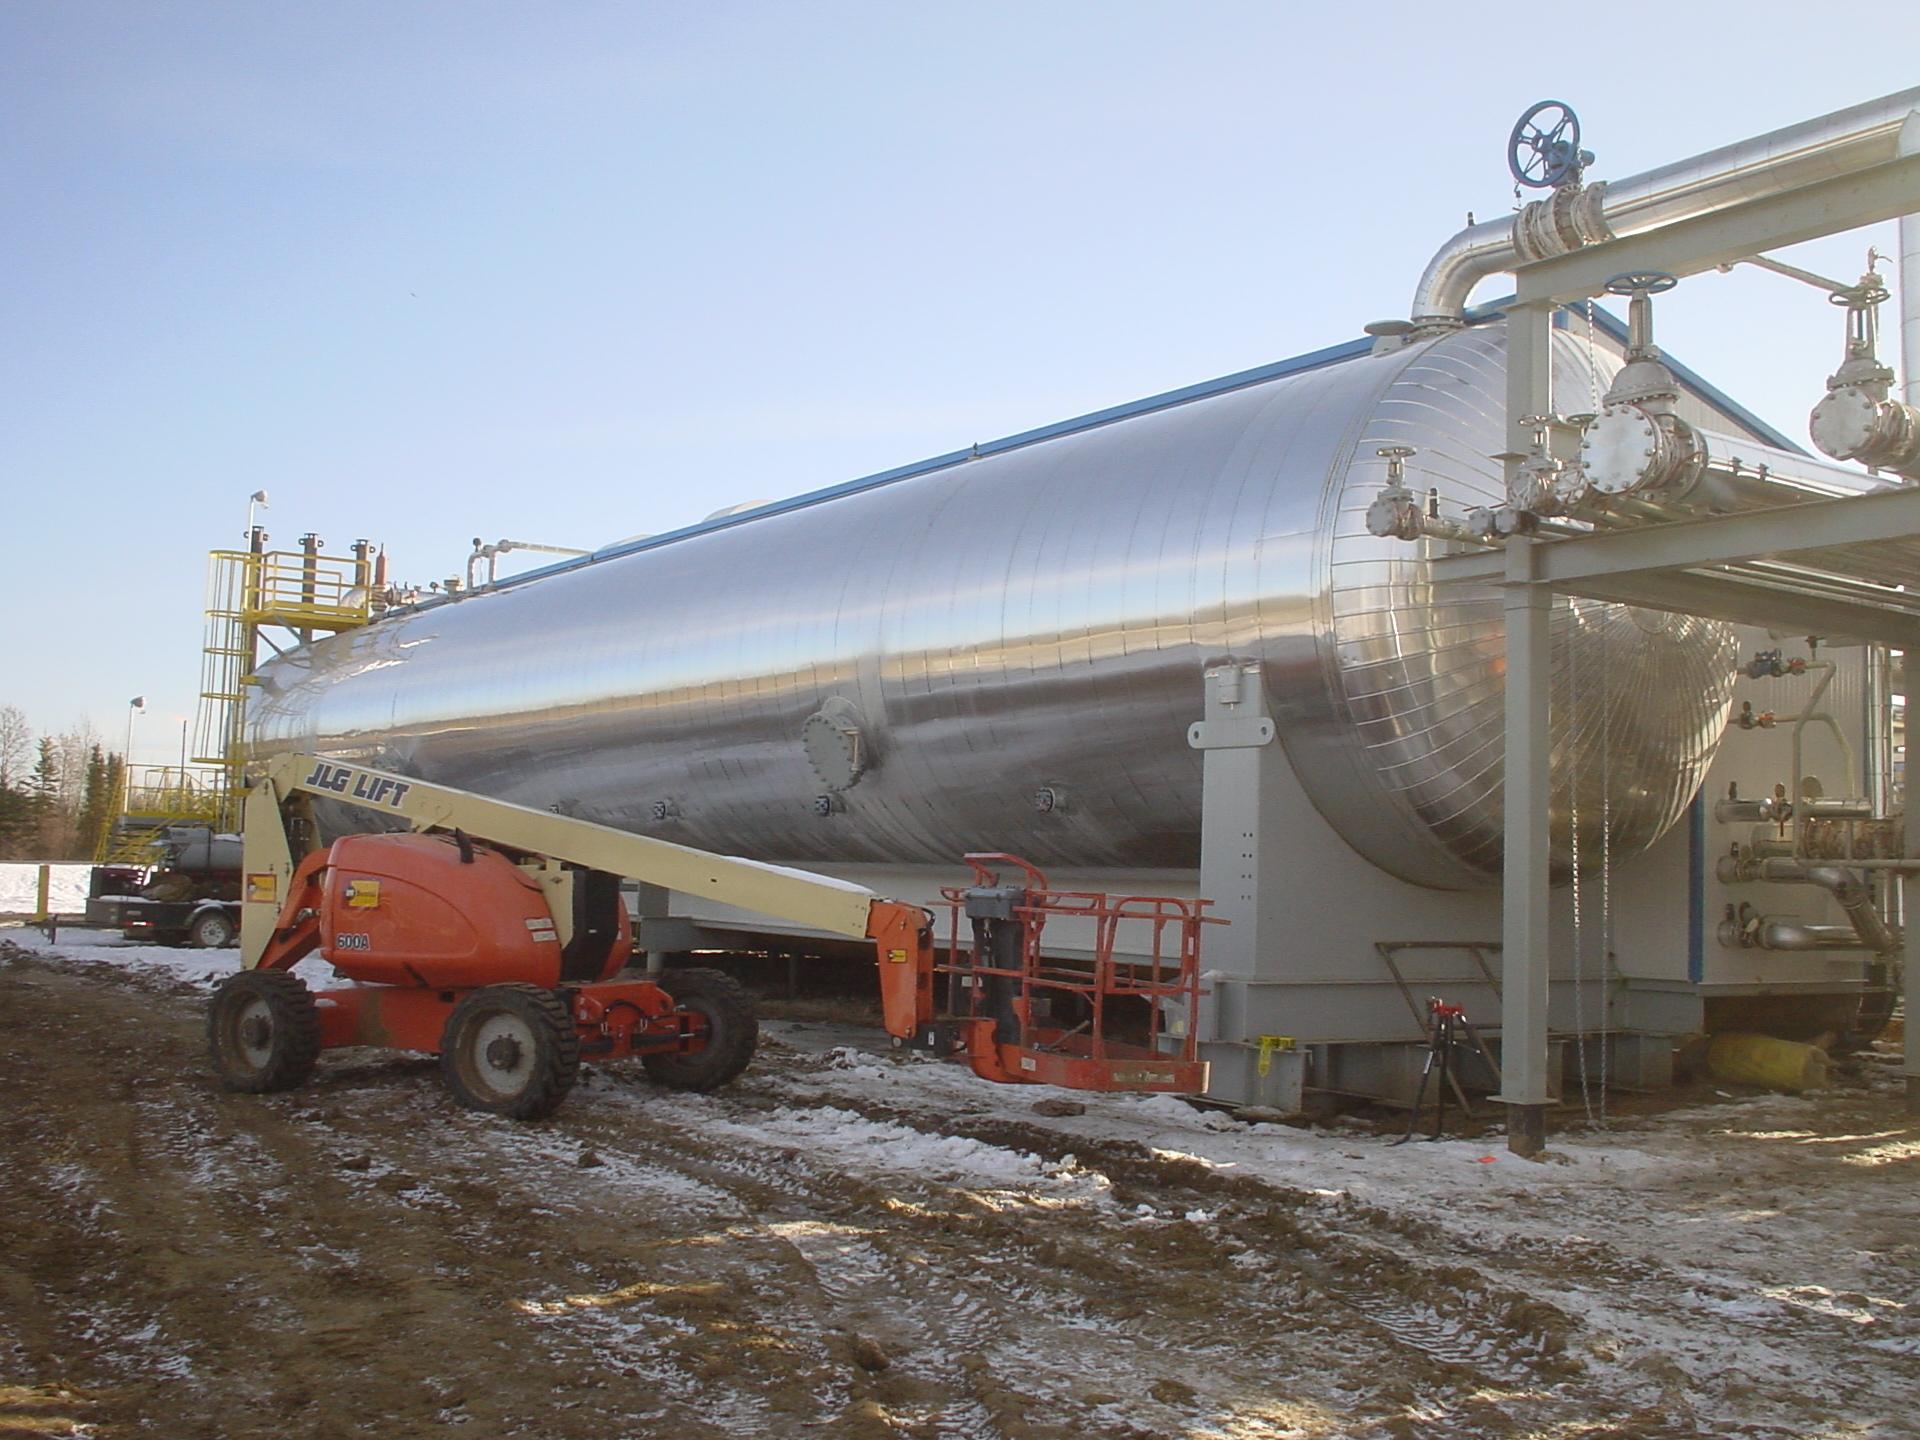 Equipment Insulation: Vessels